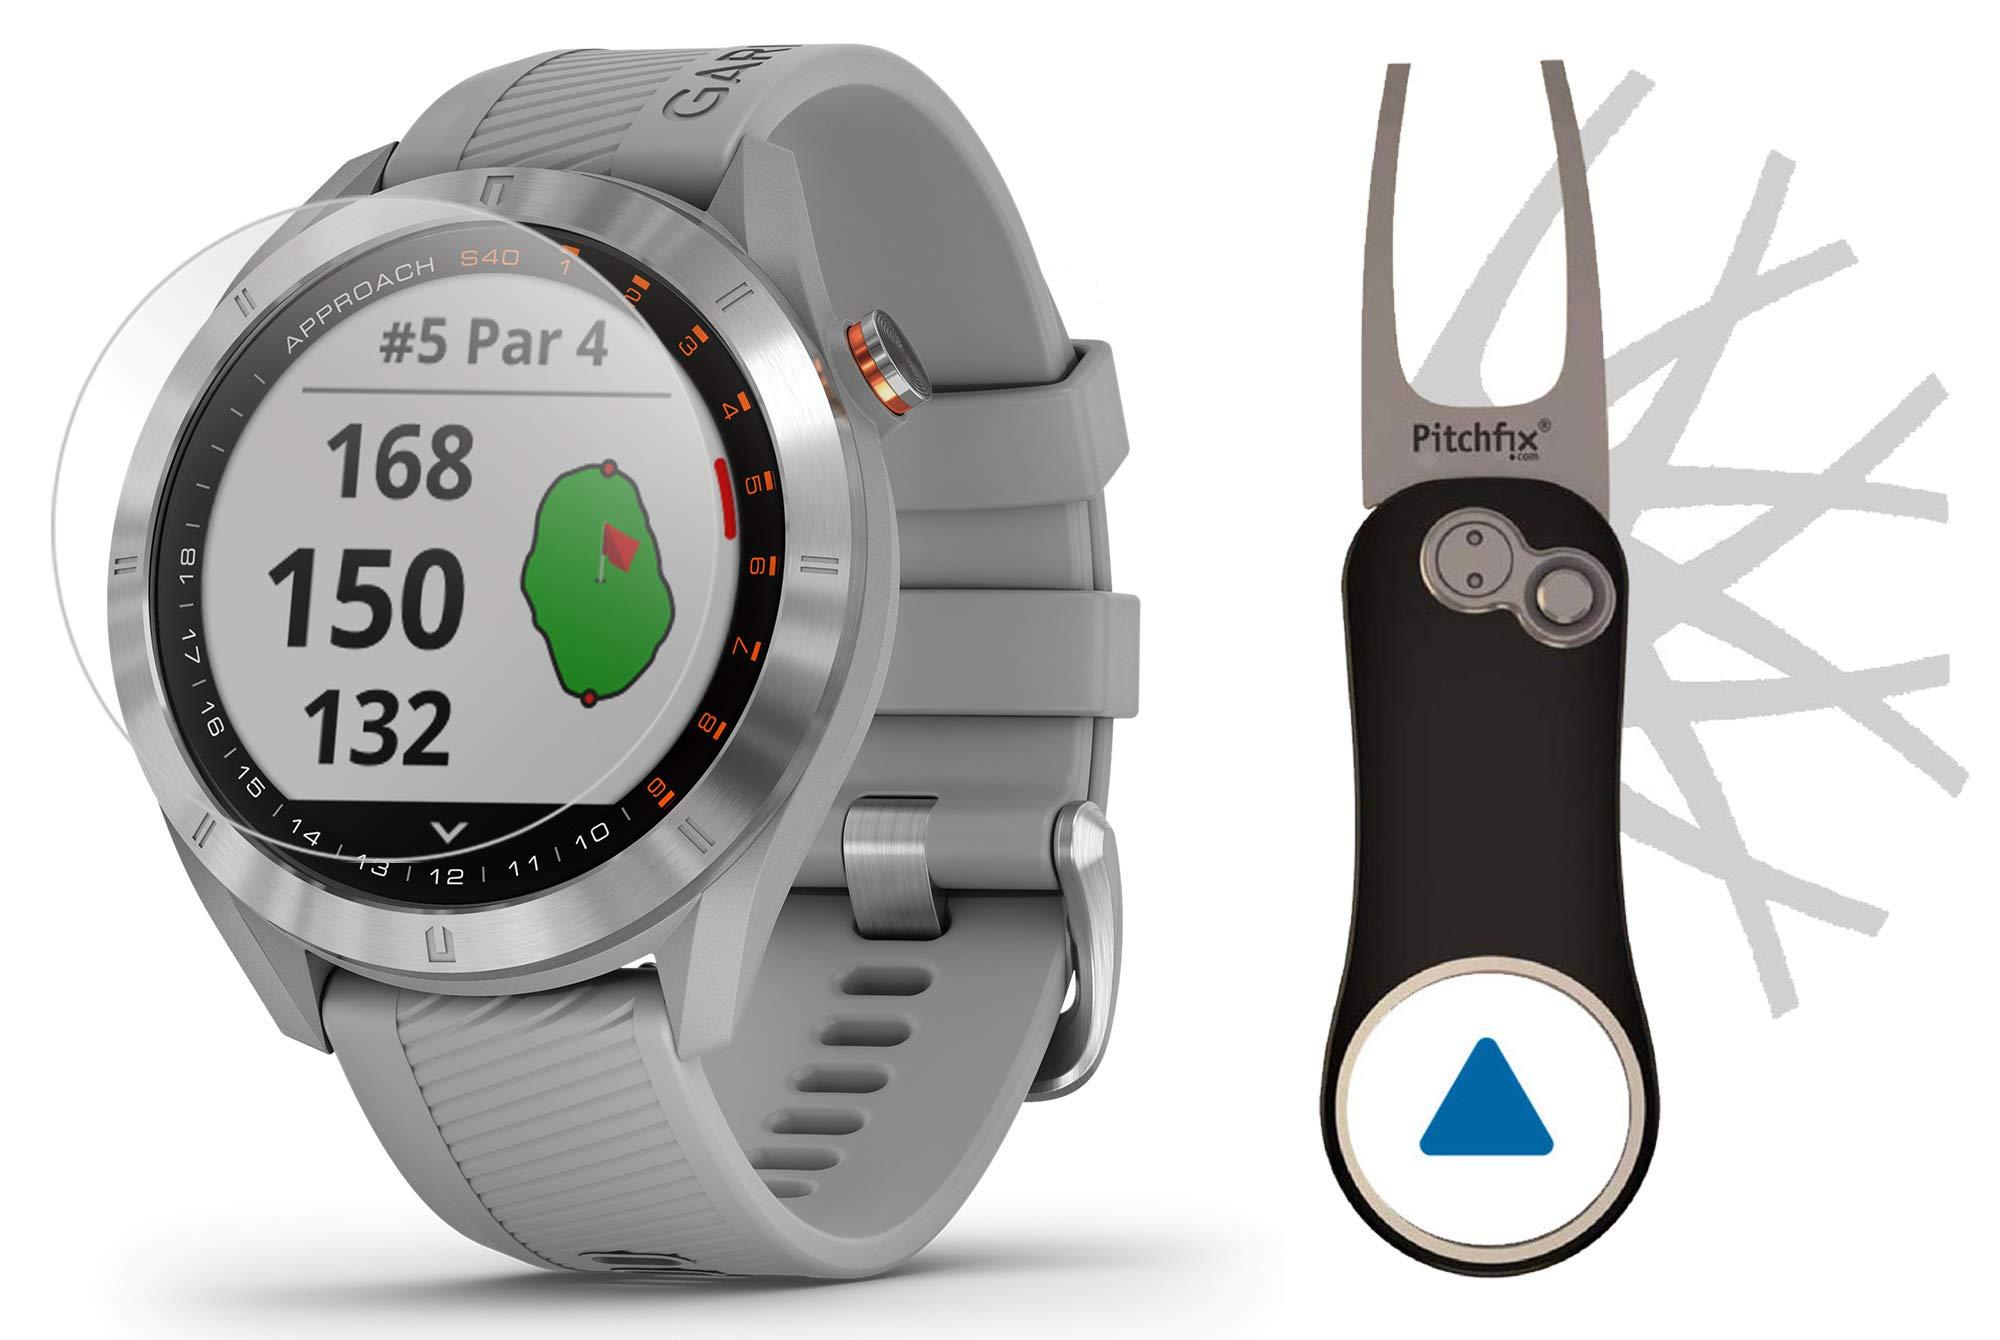 Garmin Approach S40 (Gray) Golf GPS Smartwatch Bundle   Includes Garmin/PlayBetter Pitchfix Divot Tool & HD Screen Protectors   Stainless Steel, Color Touchscreen, 41,000+ Courses   010-02140-00